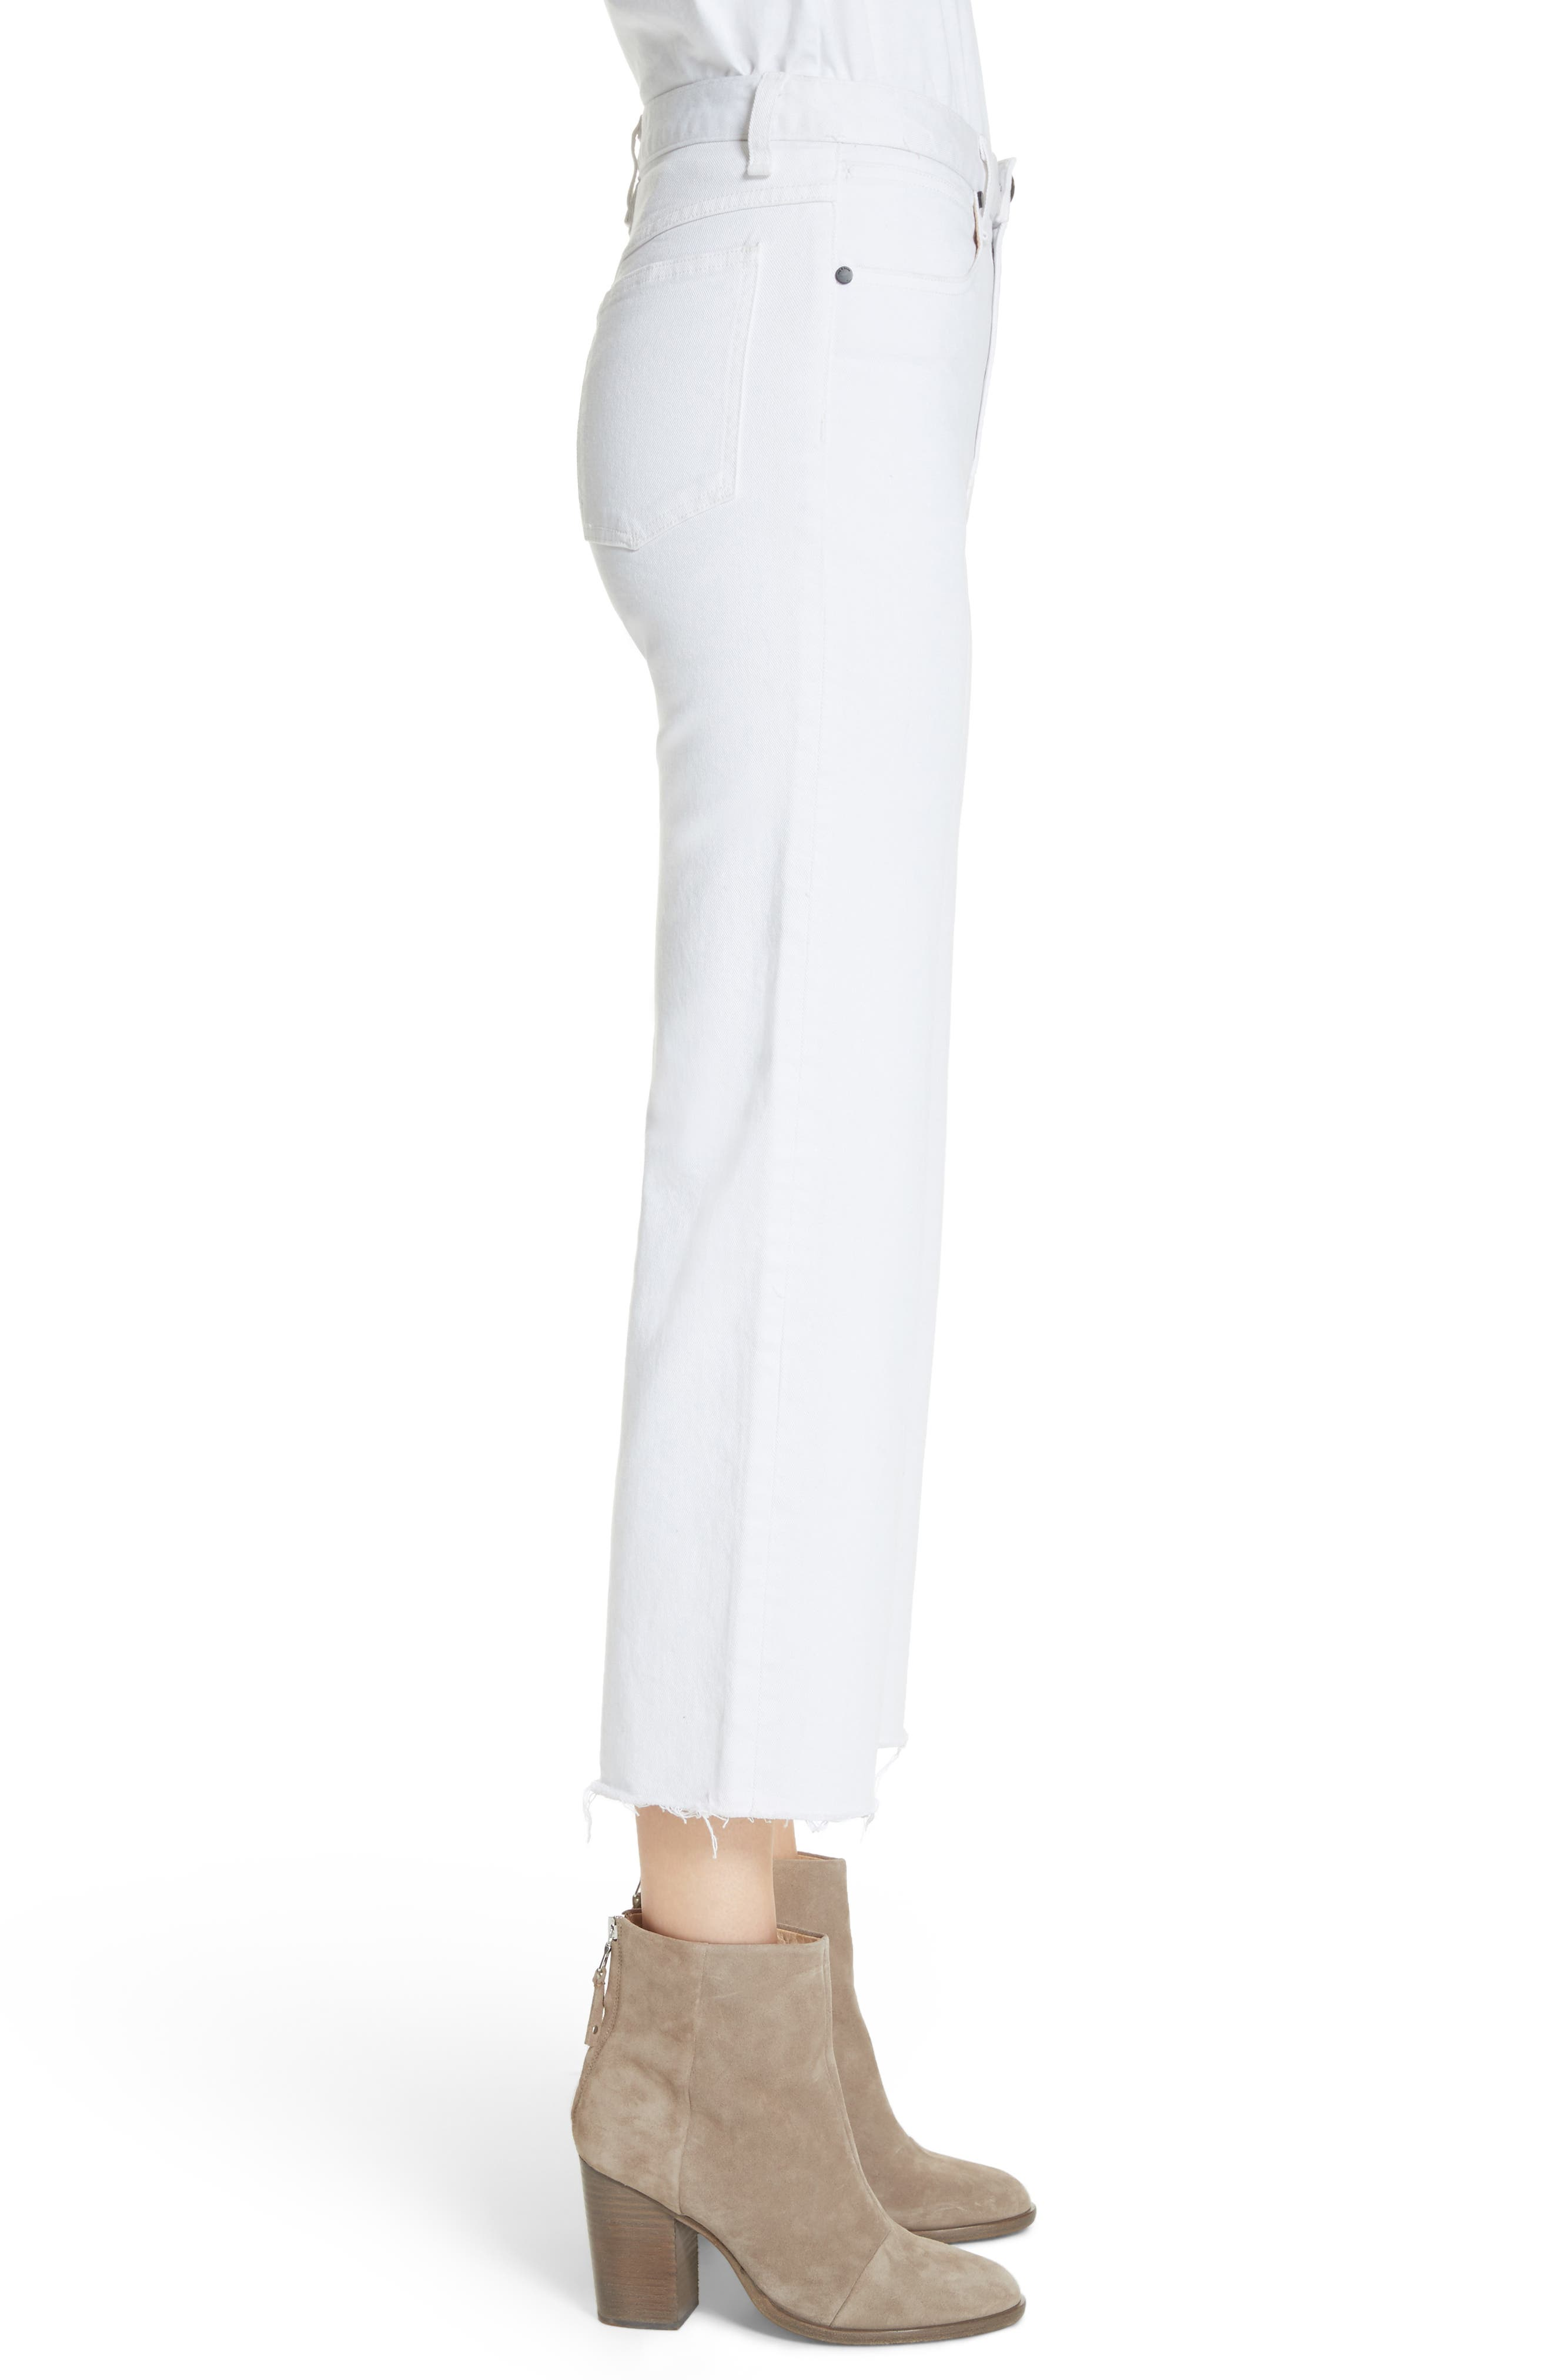 Justine High Waist Ankle Wide Leg Trouser Jeans,                             Alternate thumbnail 3, color,                             100